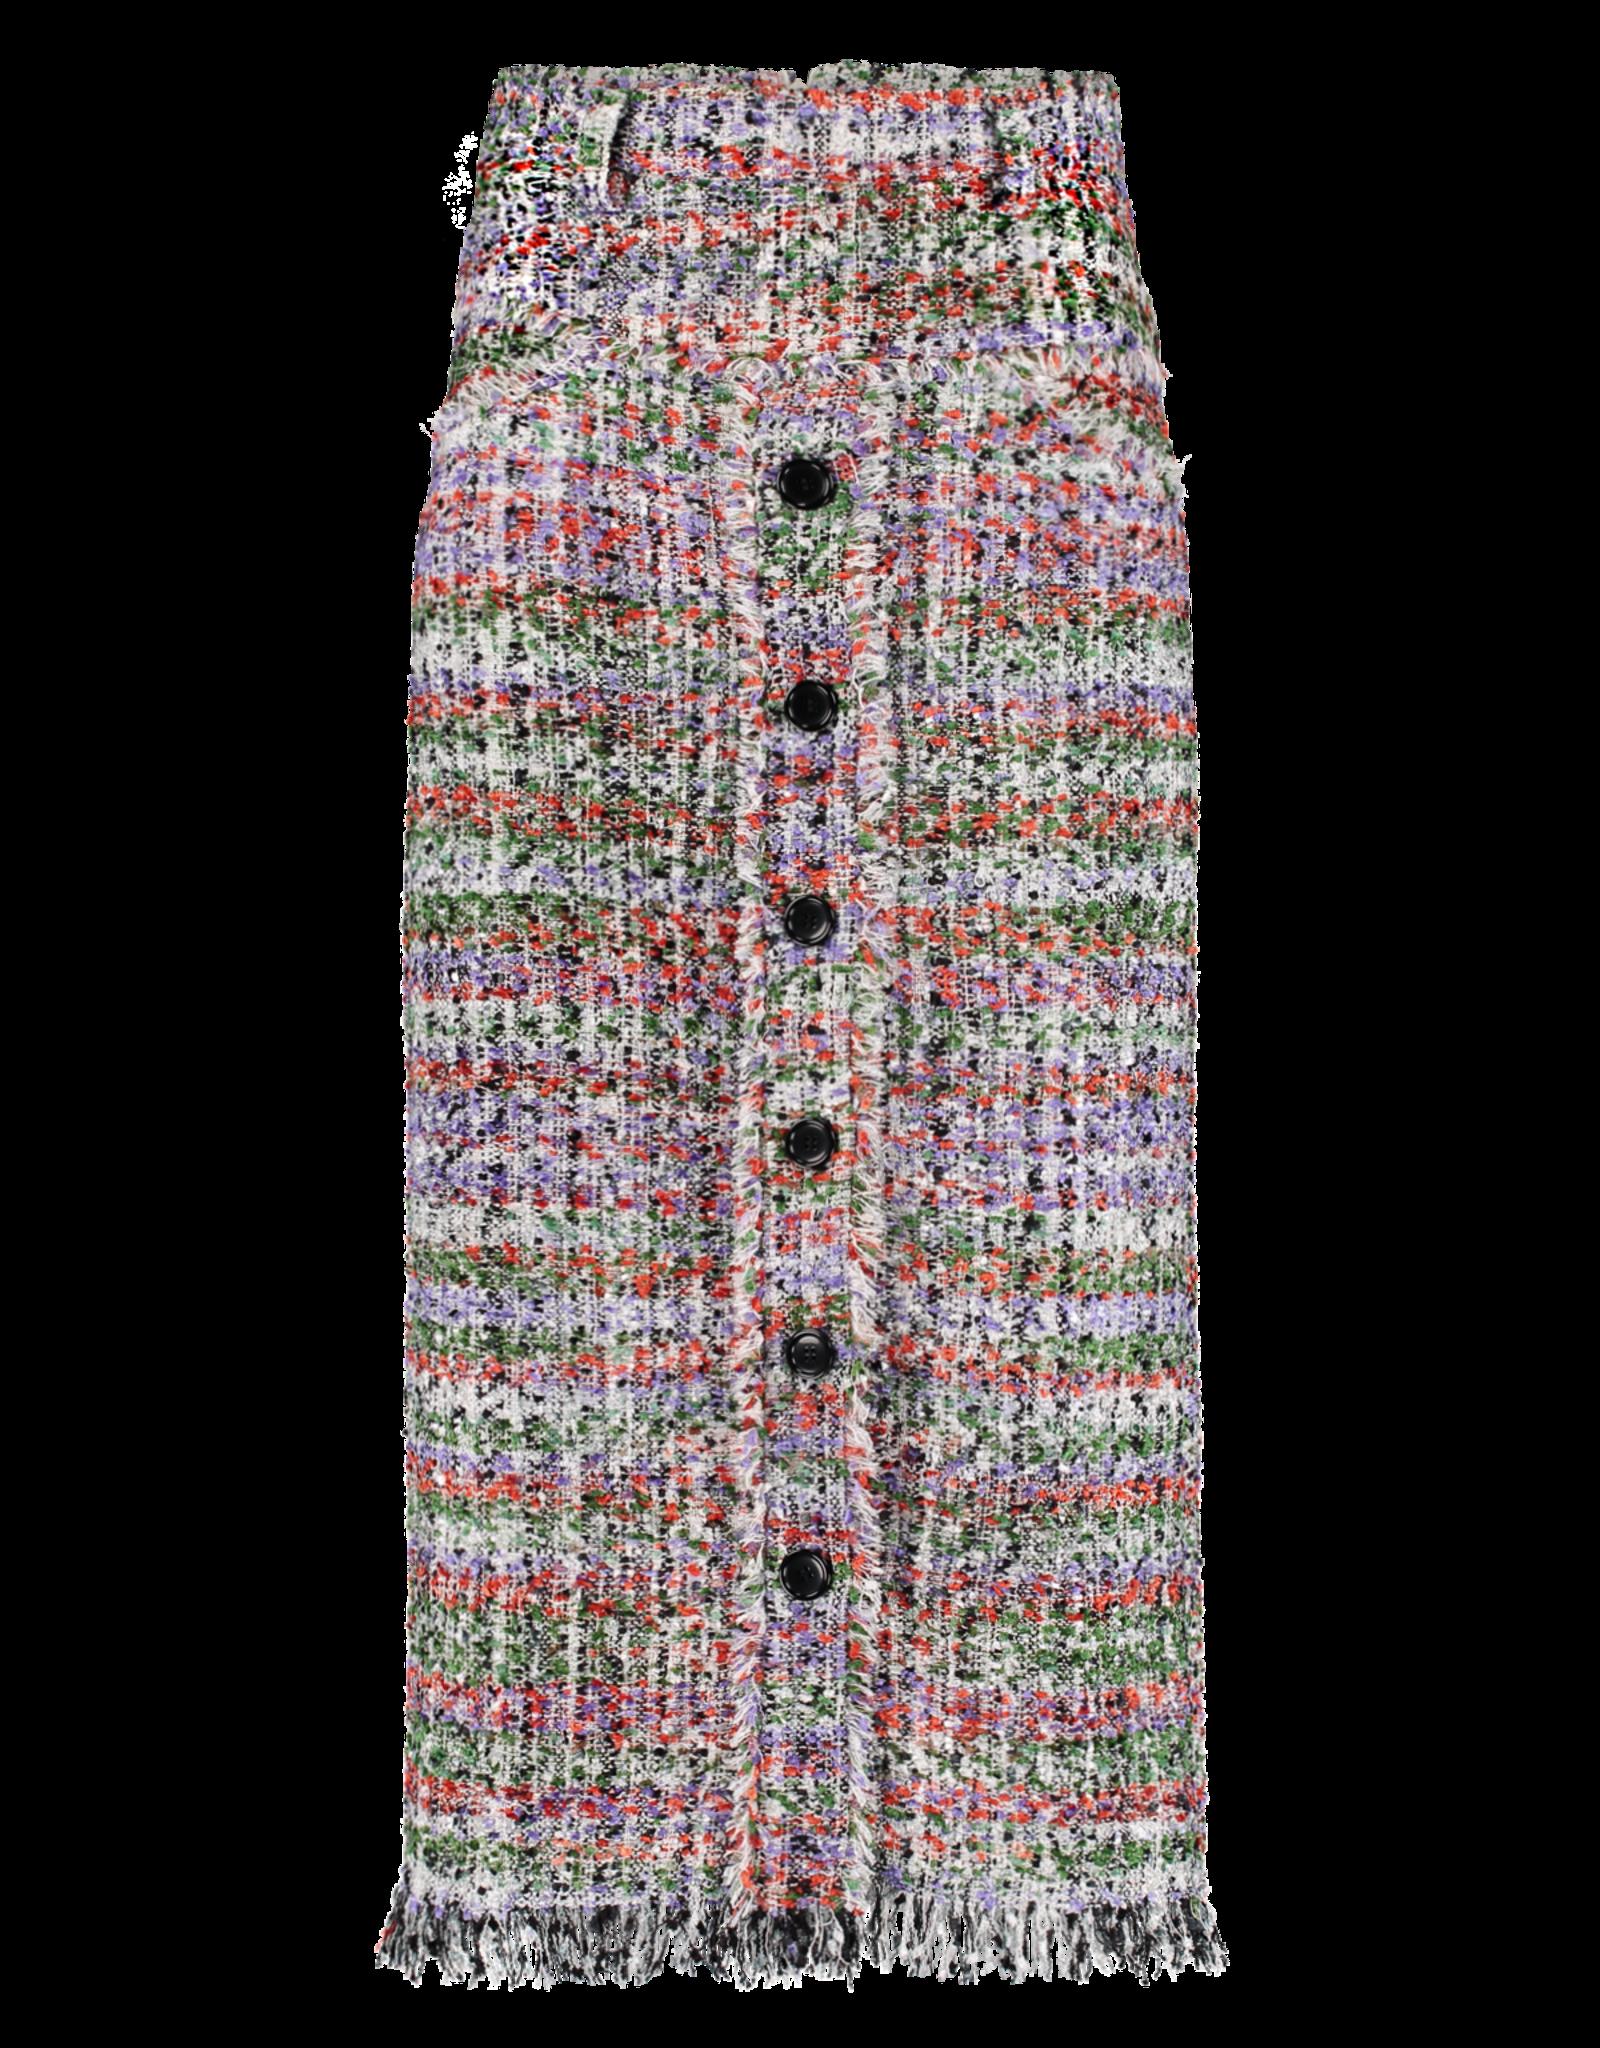 SIS by Spijkers en Spijkers SS20 305-R Long Tweed Skirt